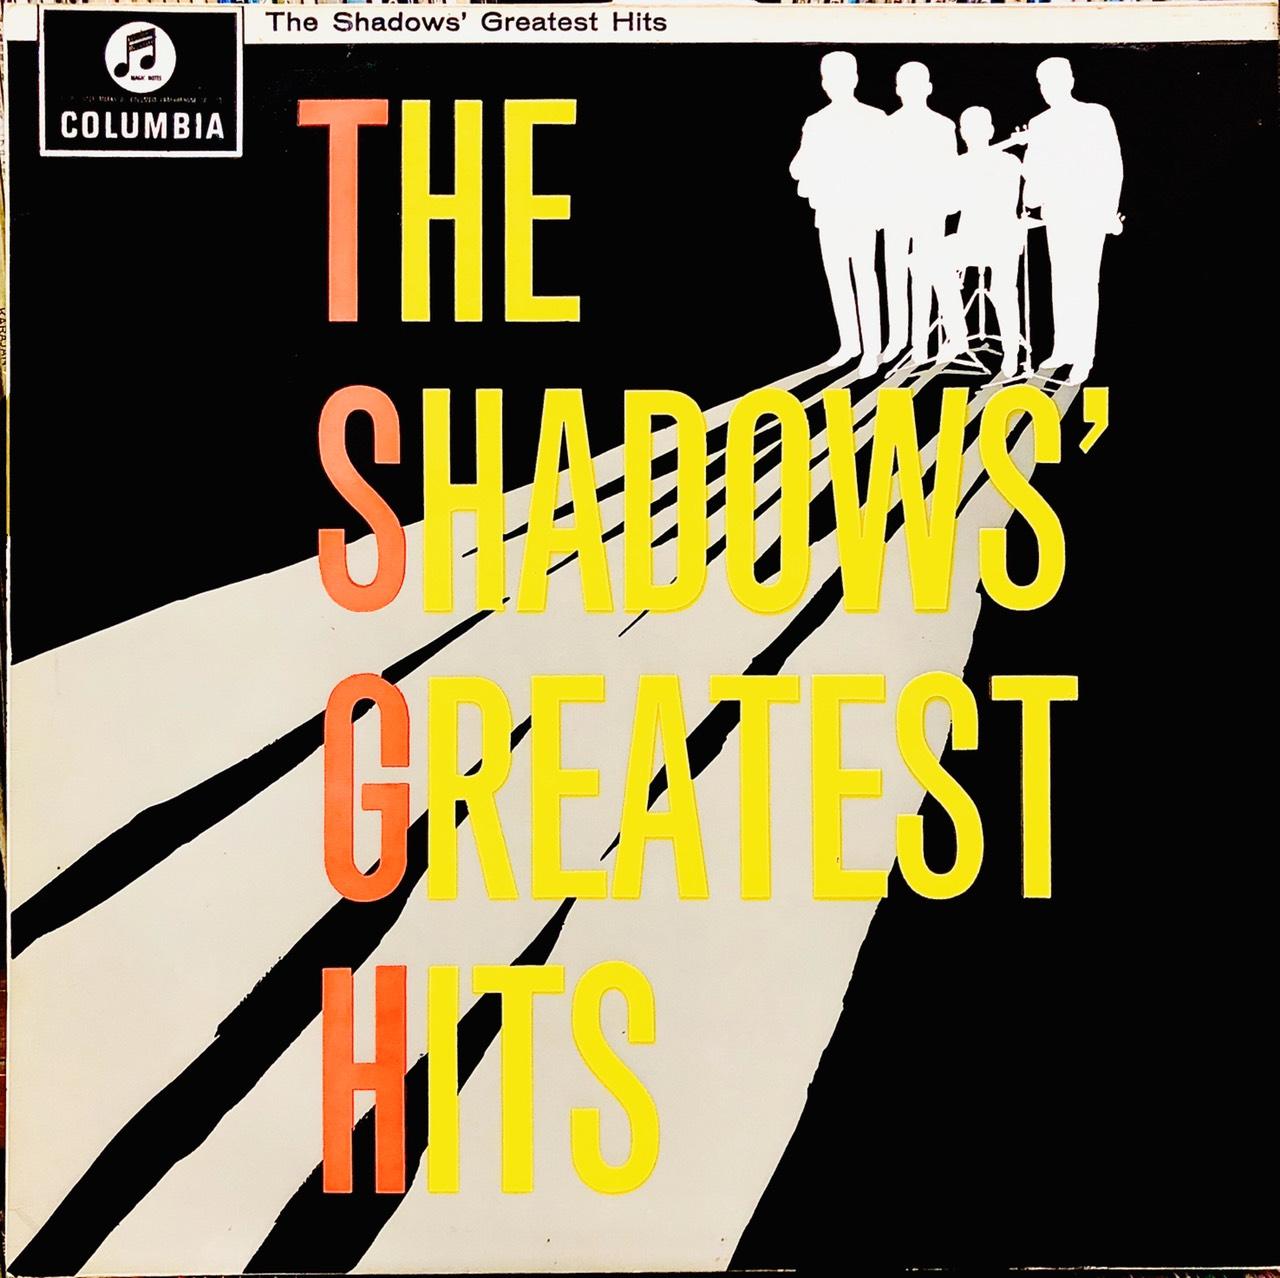 dia-than-the-shadows-greatest-hits